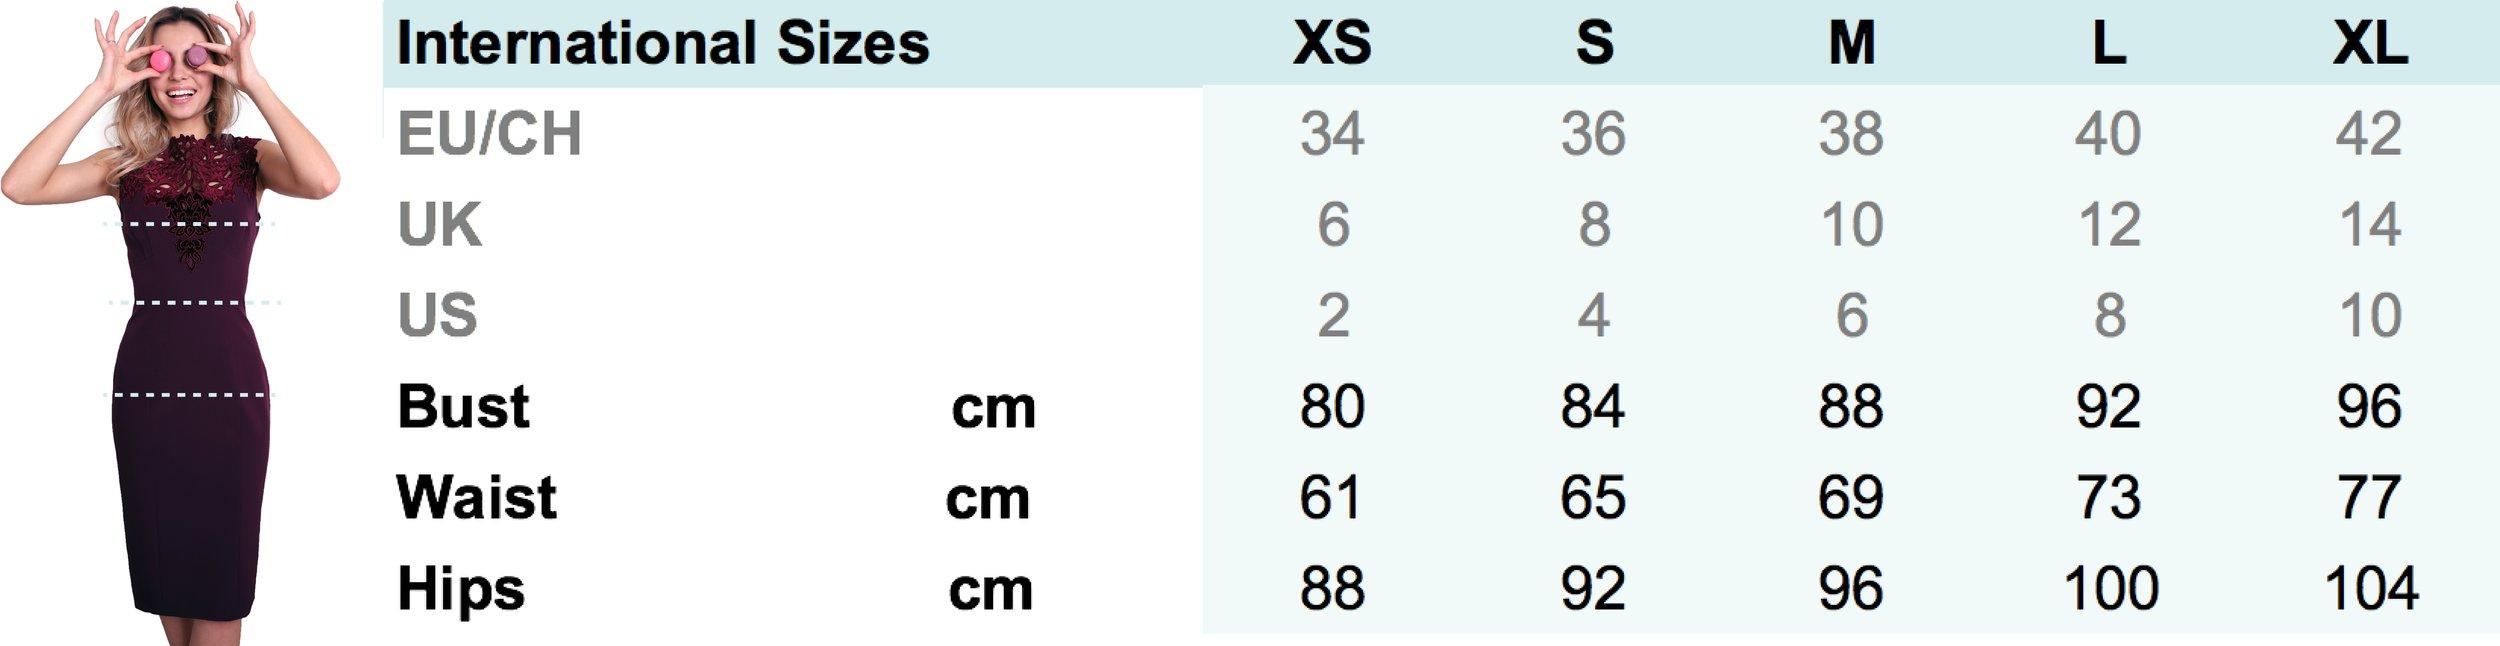 Size Table4.jpg